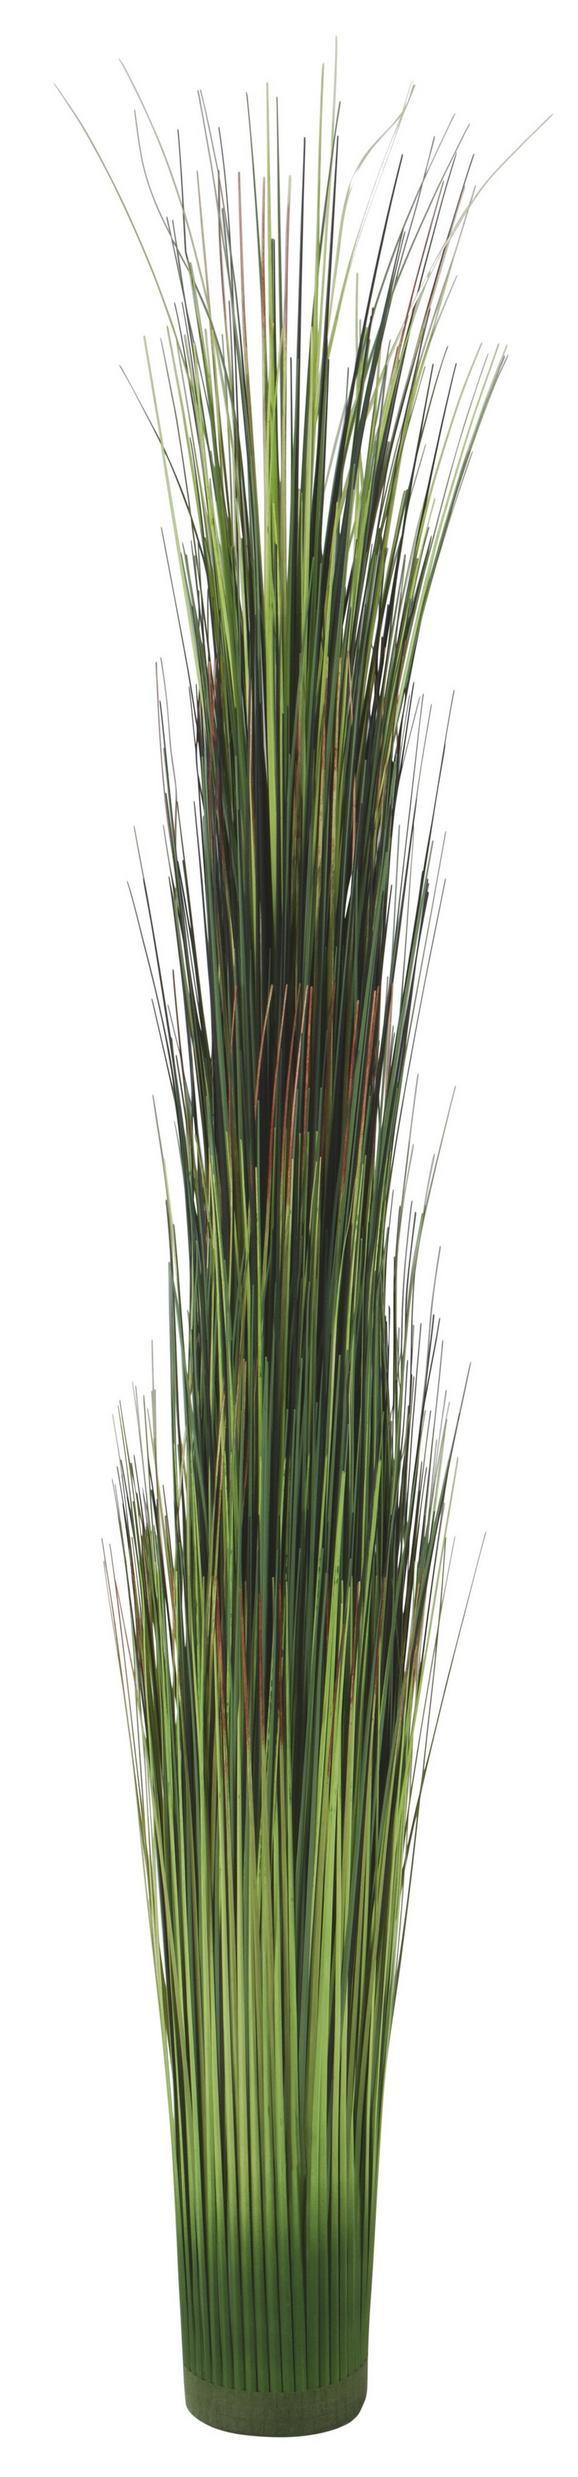 Grasbündel Markus in Grün - Grün, Kunststoff (120cm)